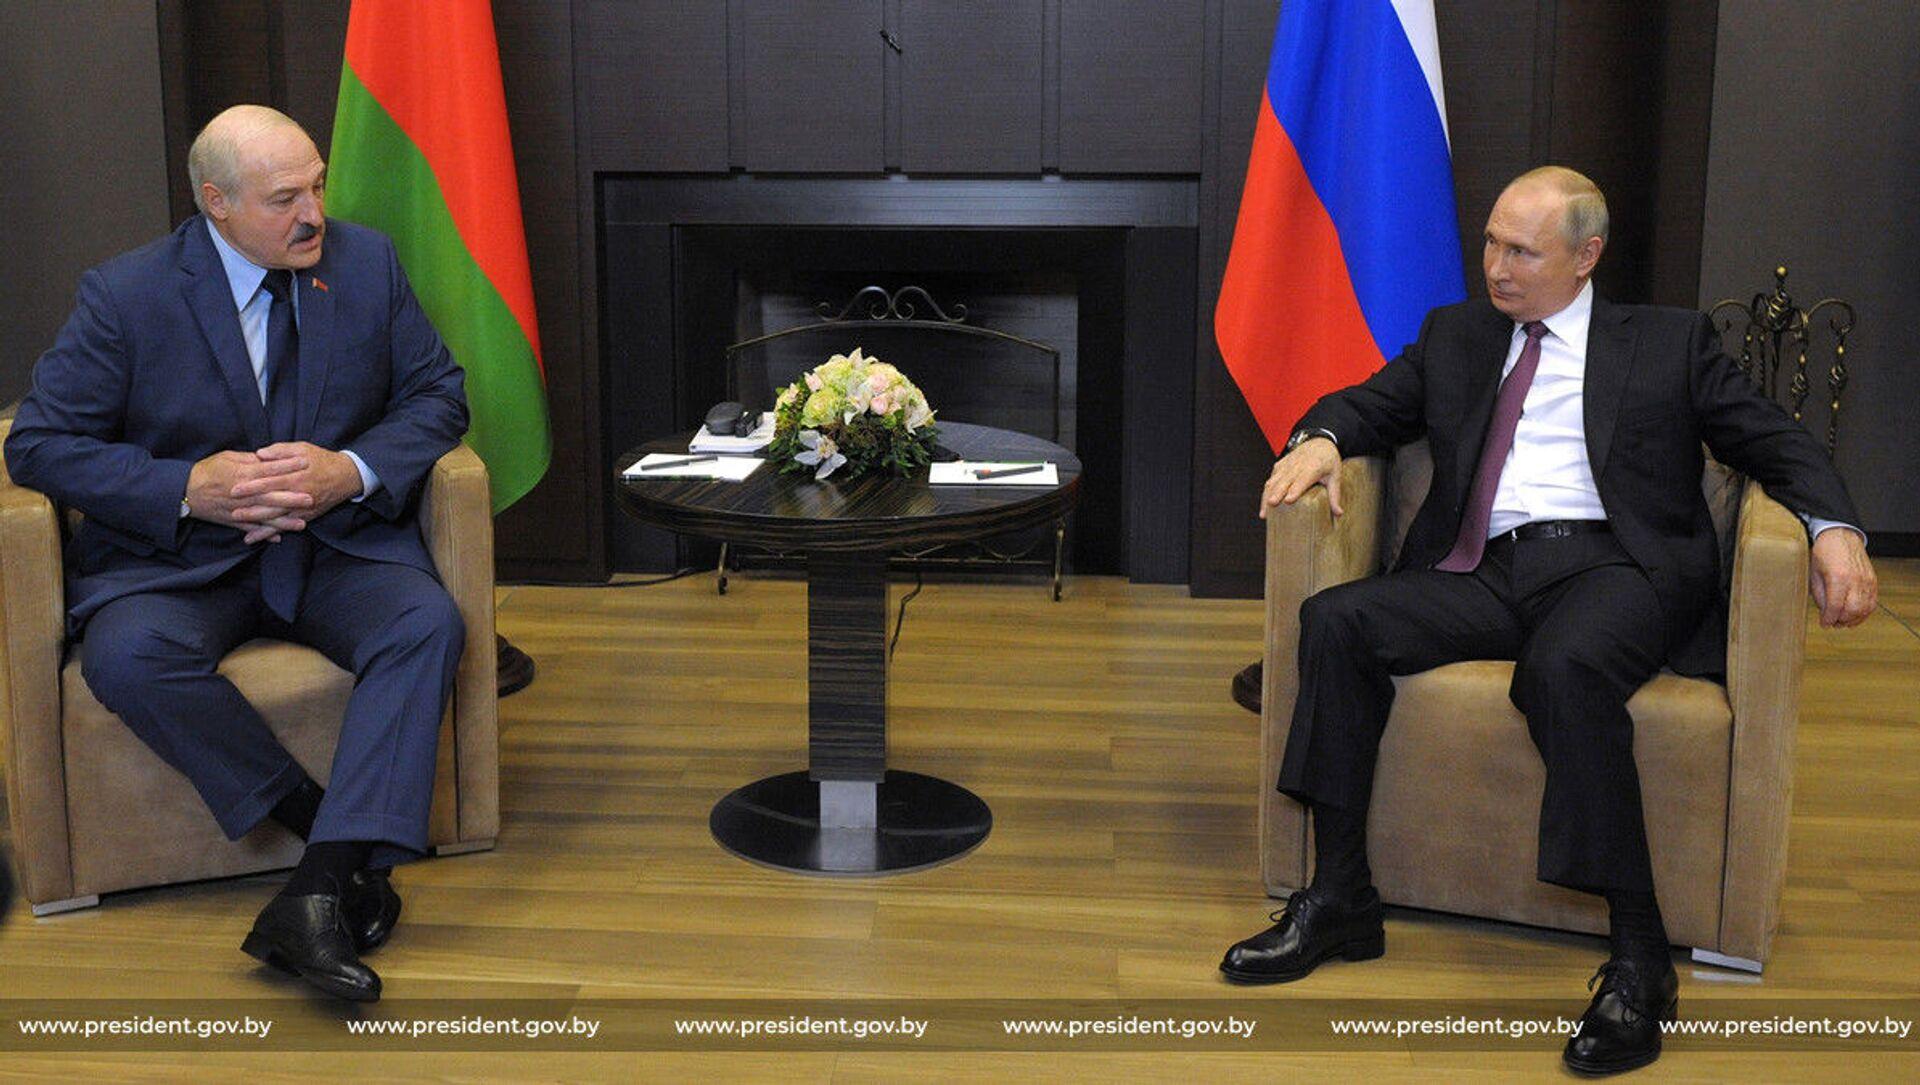 Президенты Беларуси и России Александр Лукашенко и Владимир Путин - Sputnik Беларусь, 1920, 29.05.2021